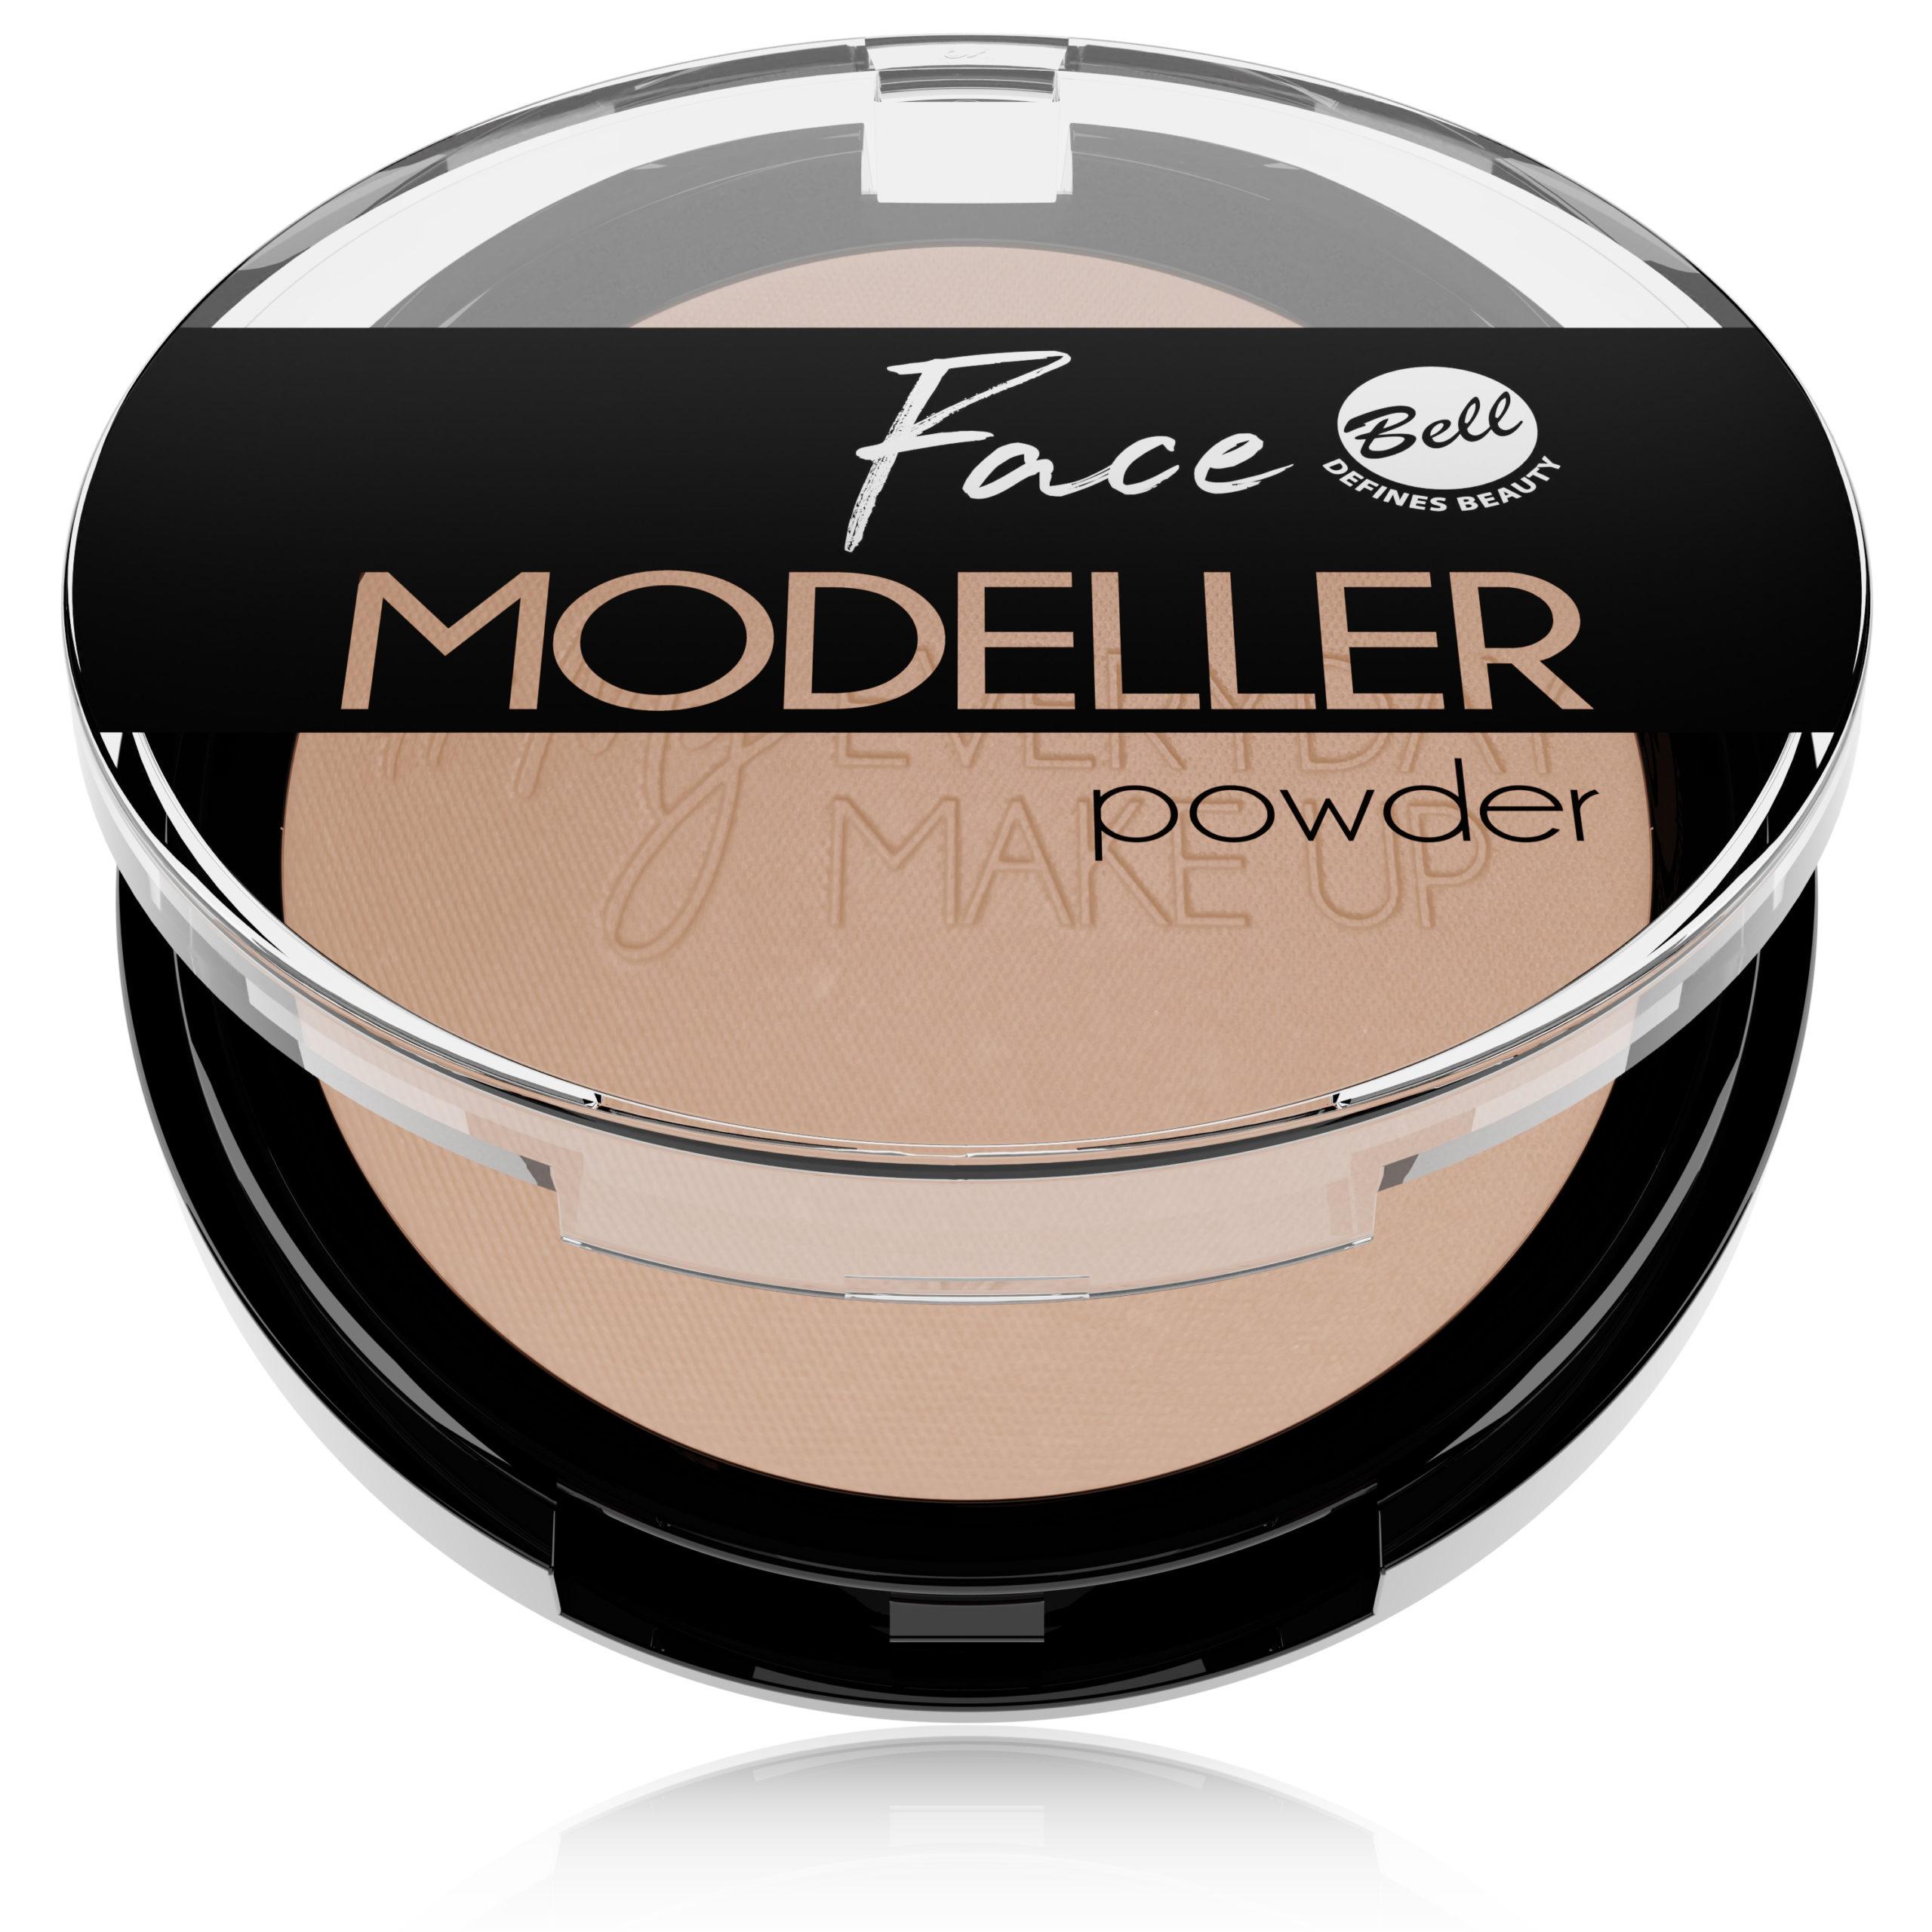 Face Modeller Powder